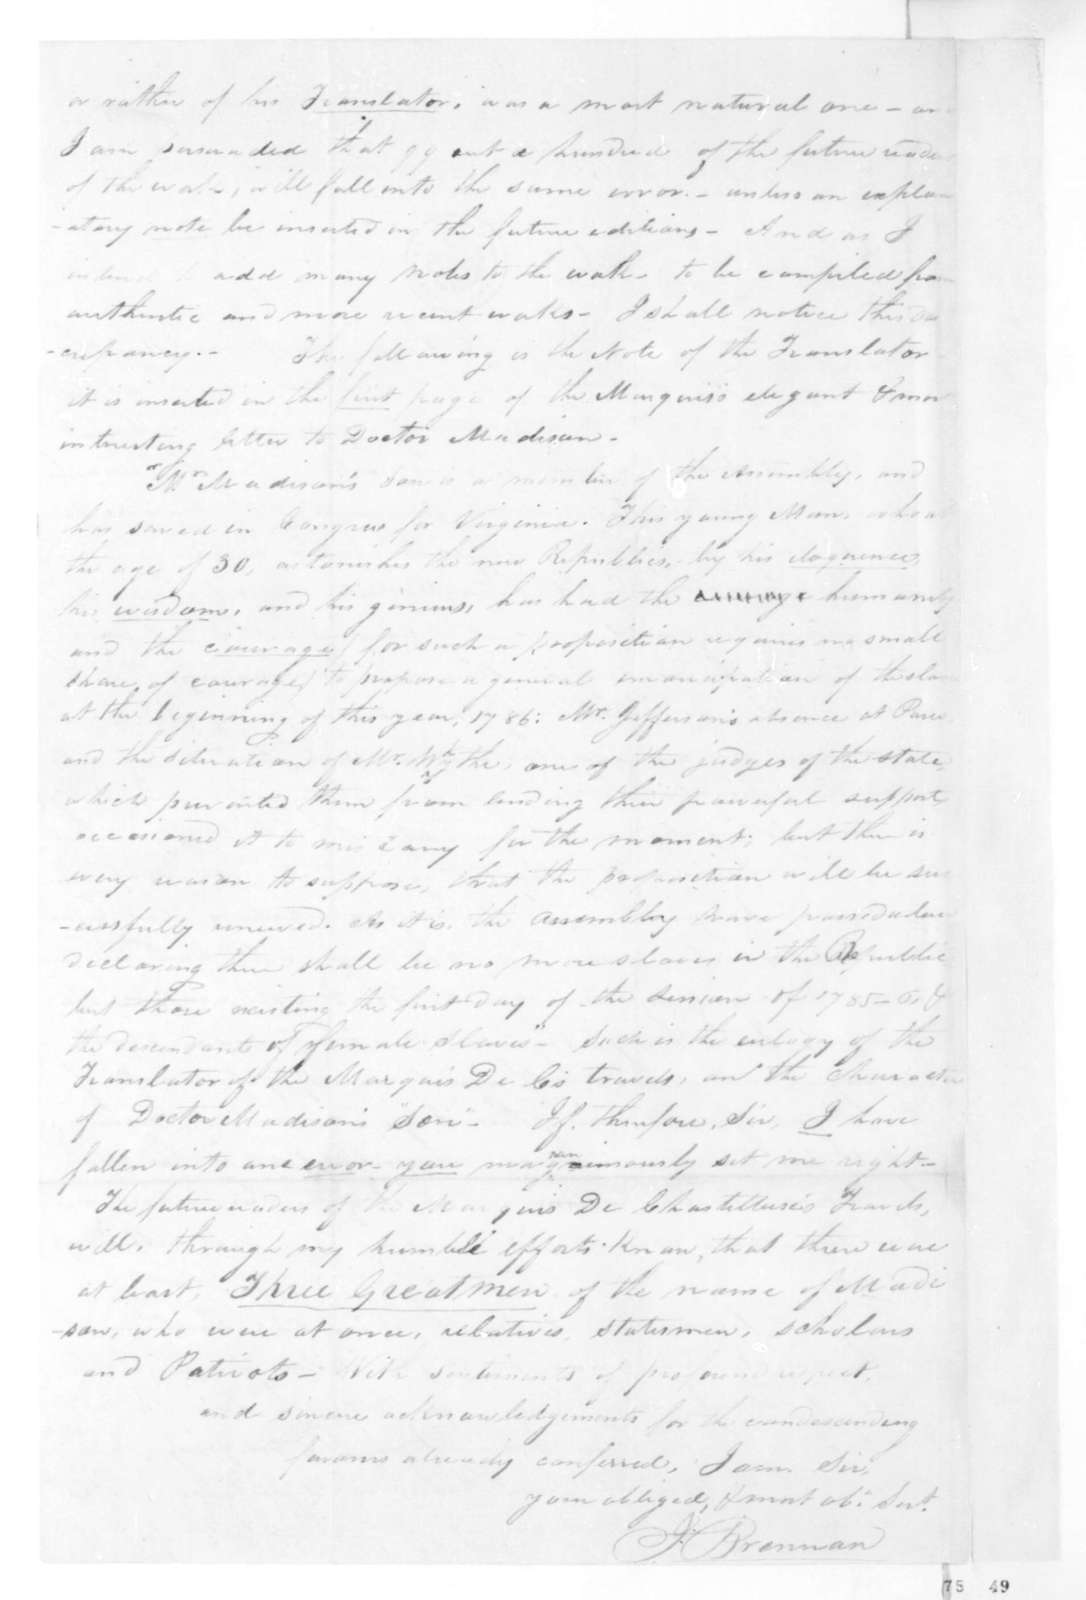 John Brennan to James Madison, September 16, 1825.